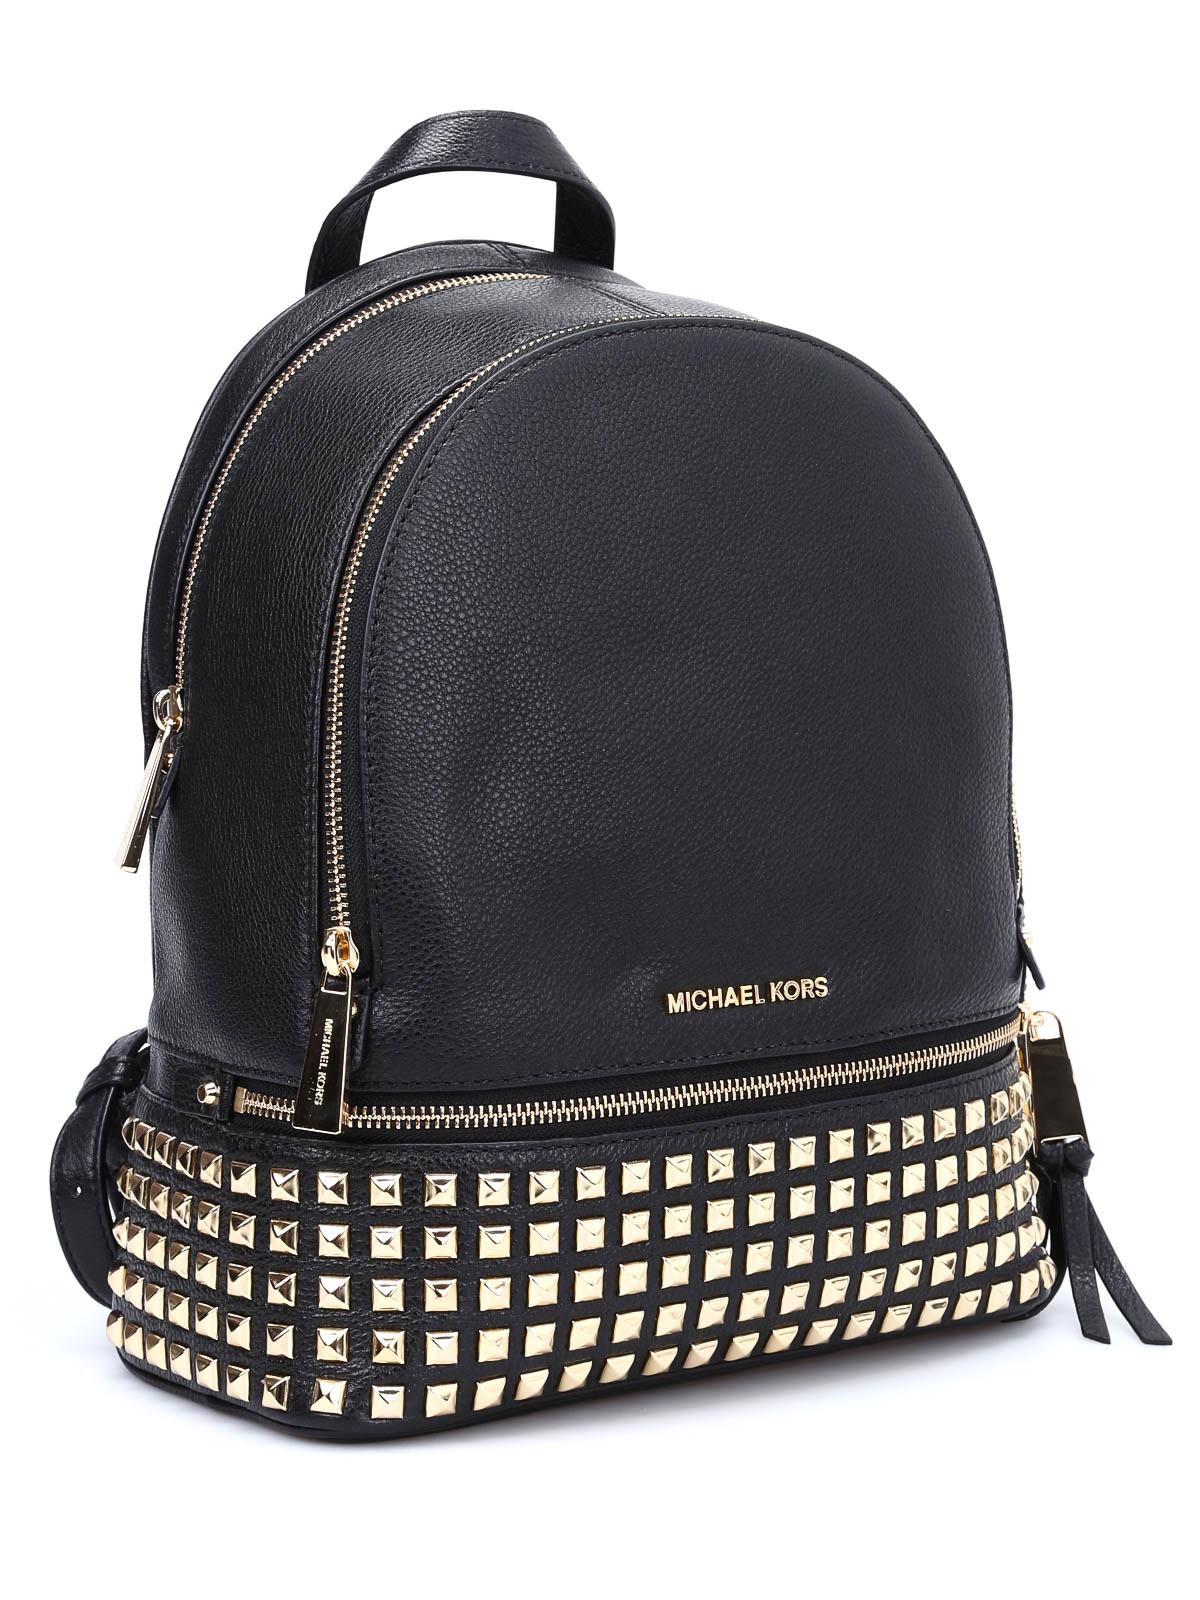 378ad0abed29ba Michael Kors - Rhea medium studded backpack - backpacks - 30S5GEZB5L 001